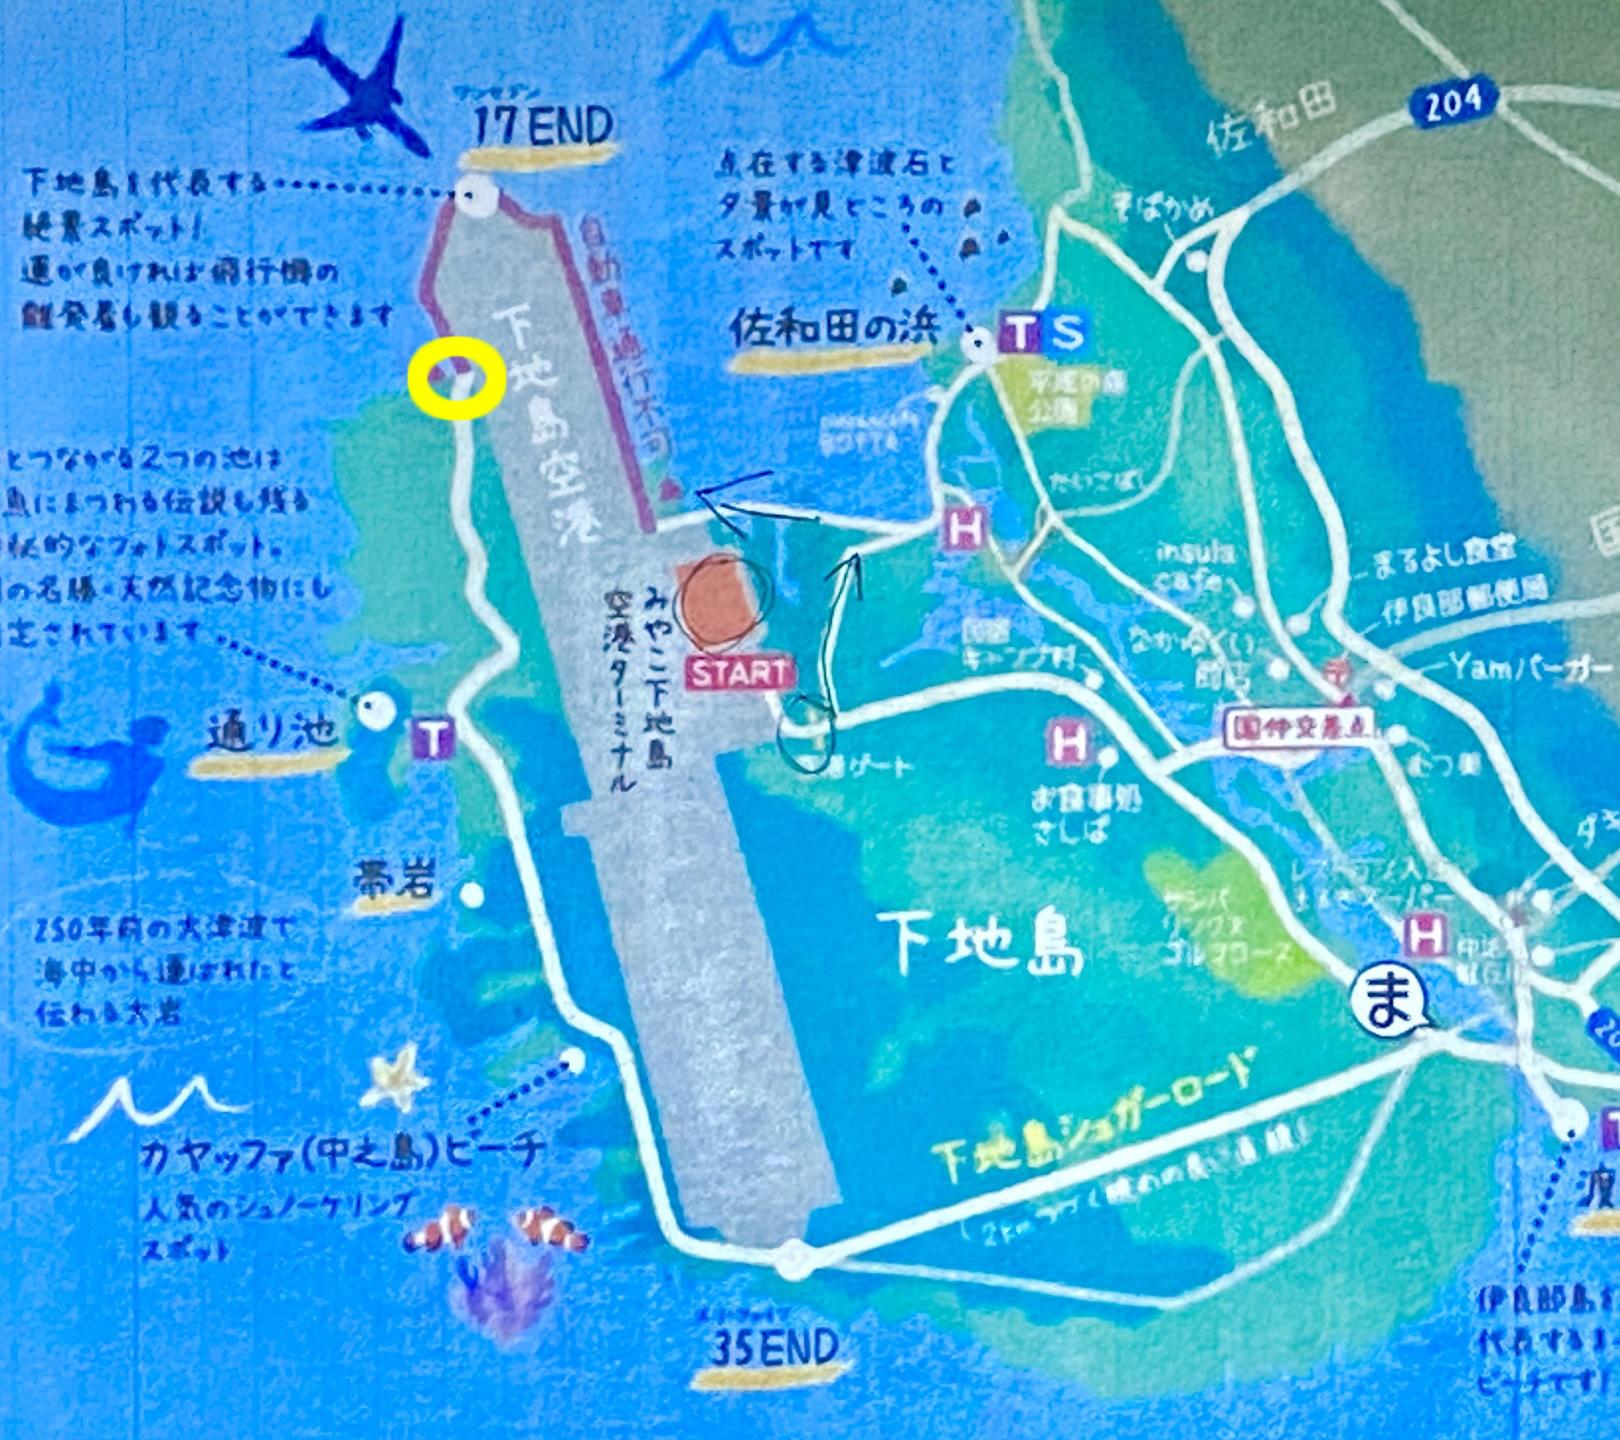 下地島MAP